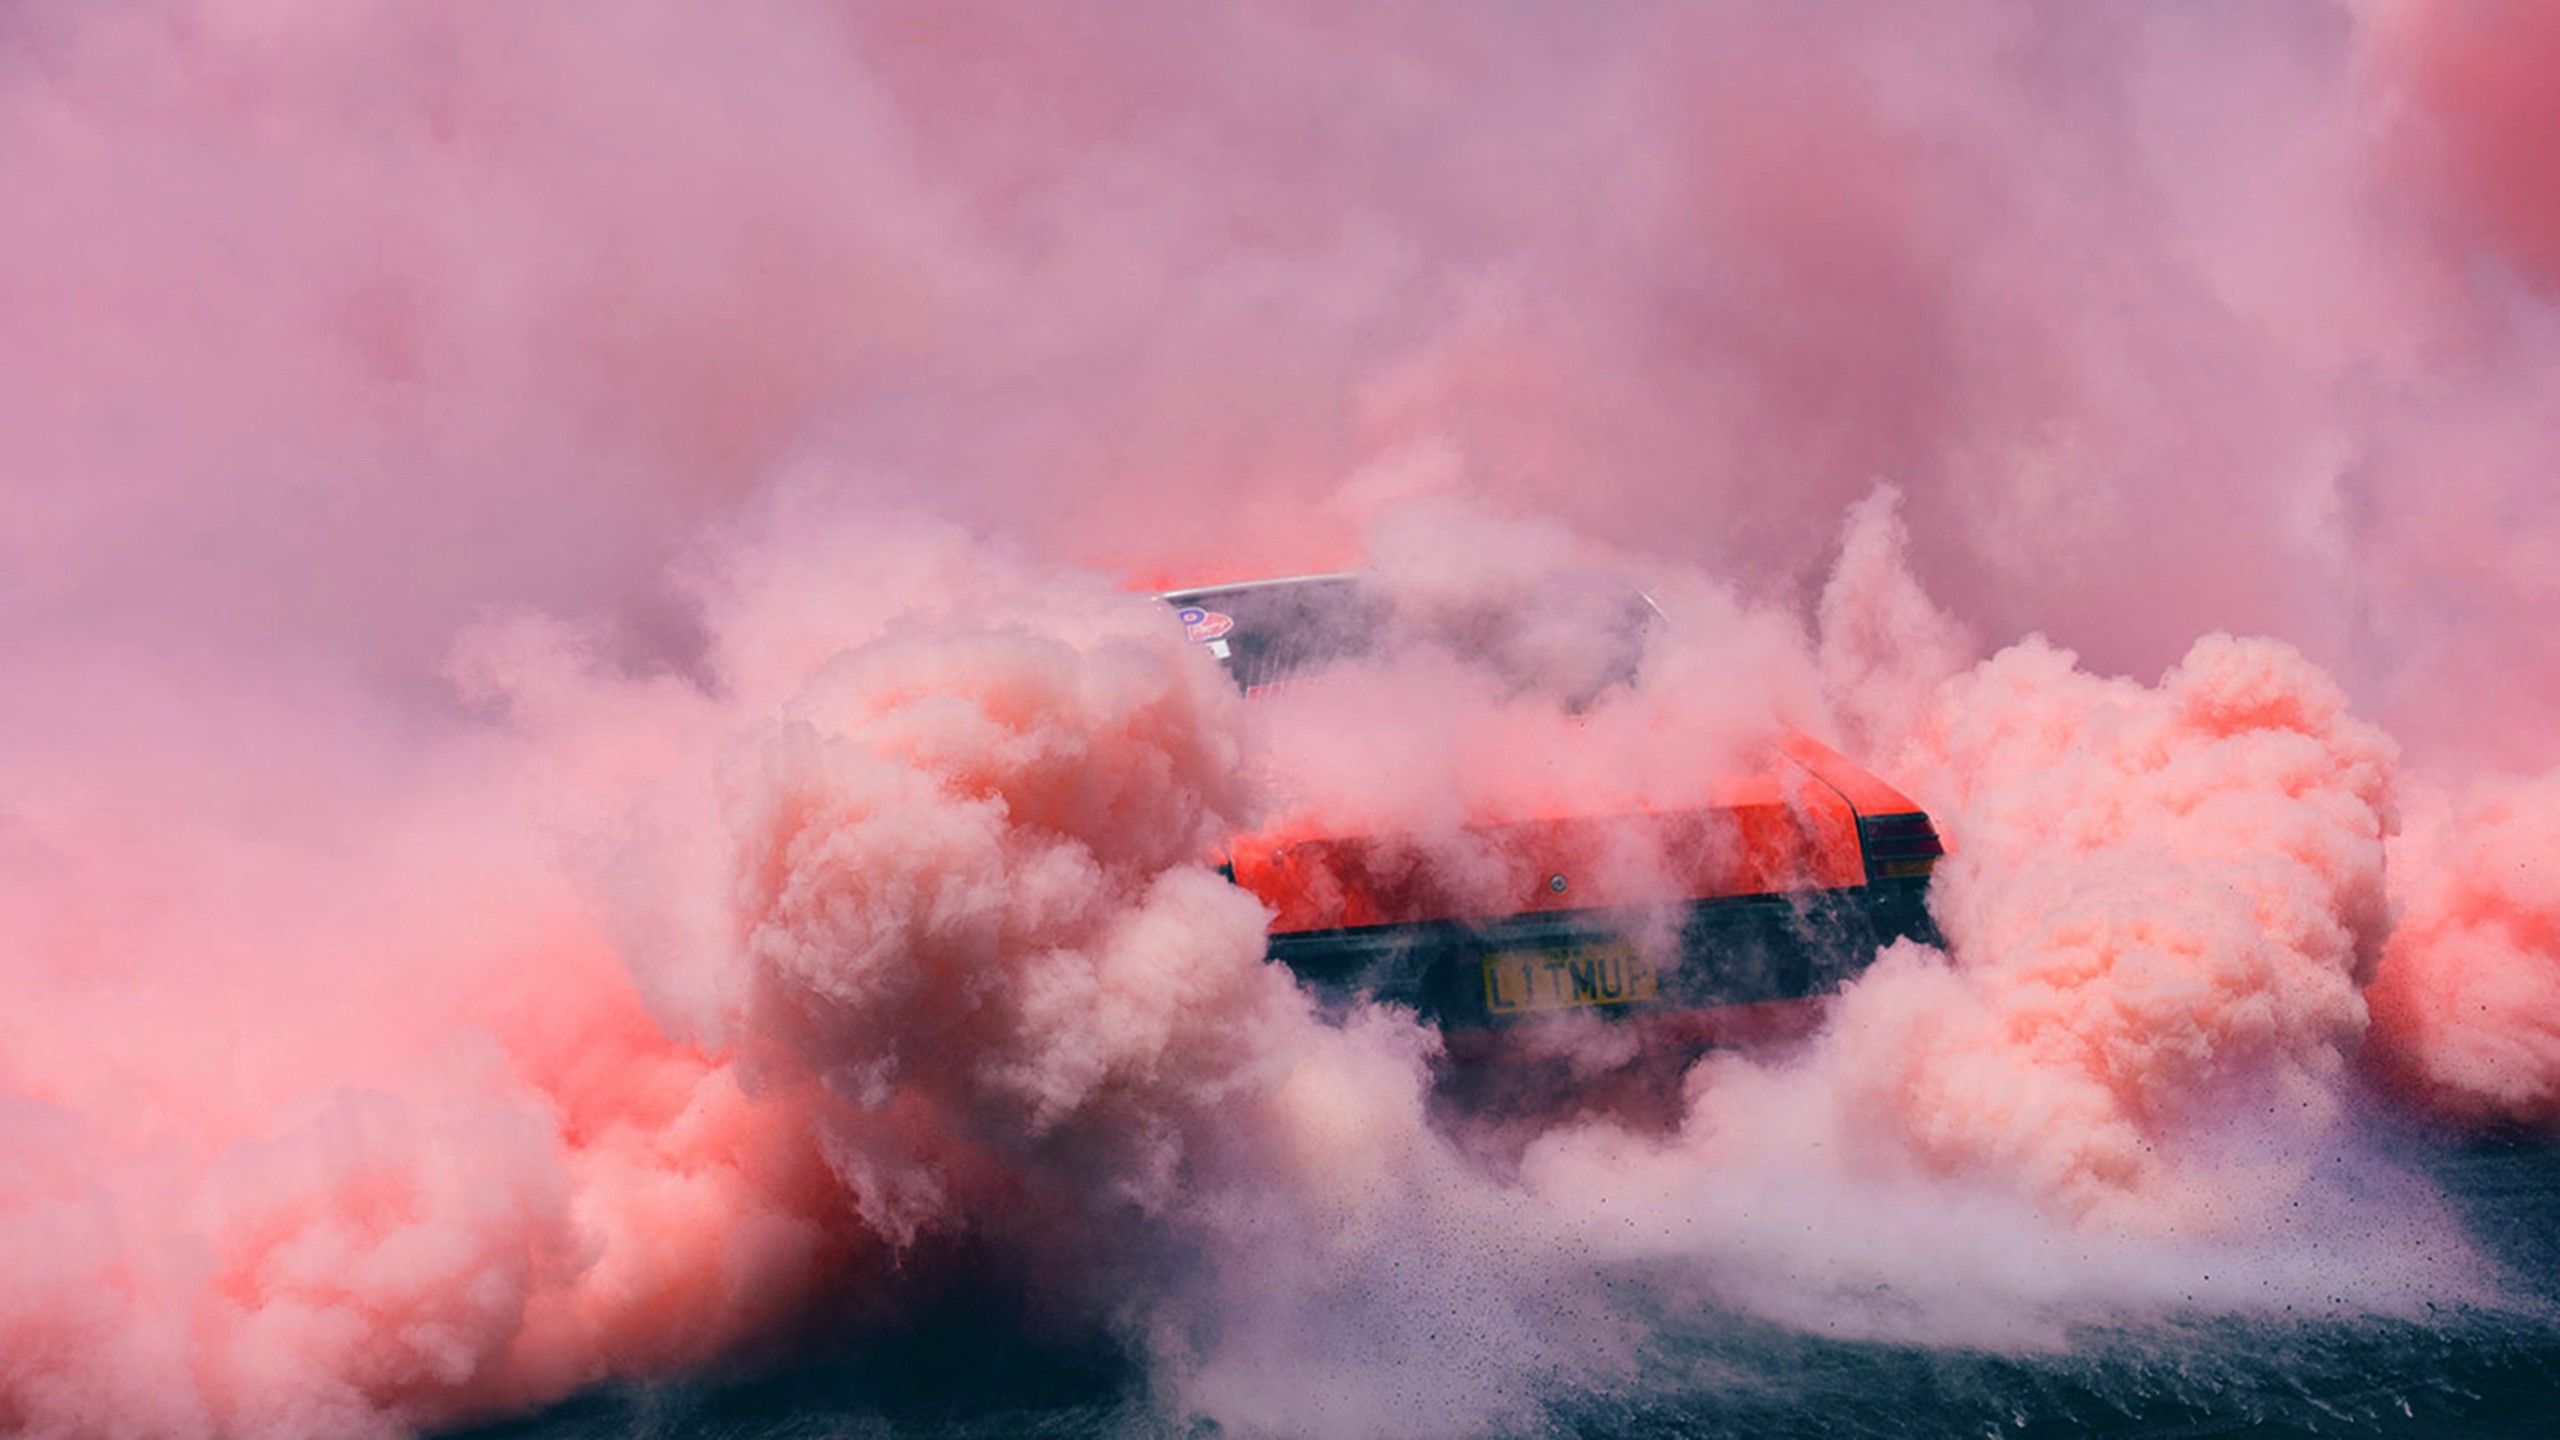 Goodfon Wallpaper Car วอลเปเปอร์ 2560x1440 Px ควันสี สีชมพู รถสีแดง สูบ